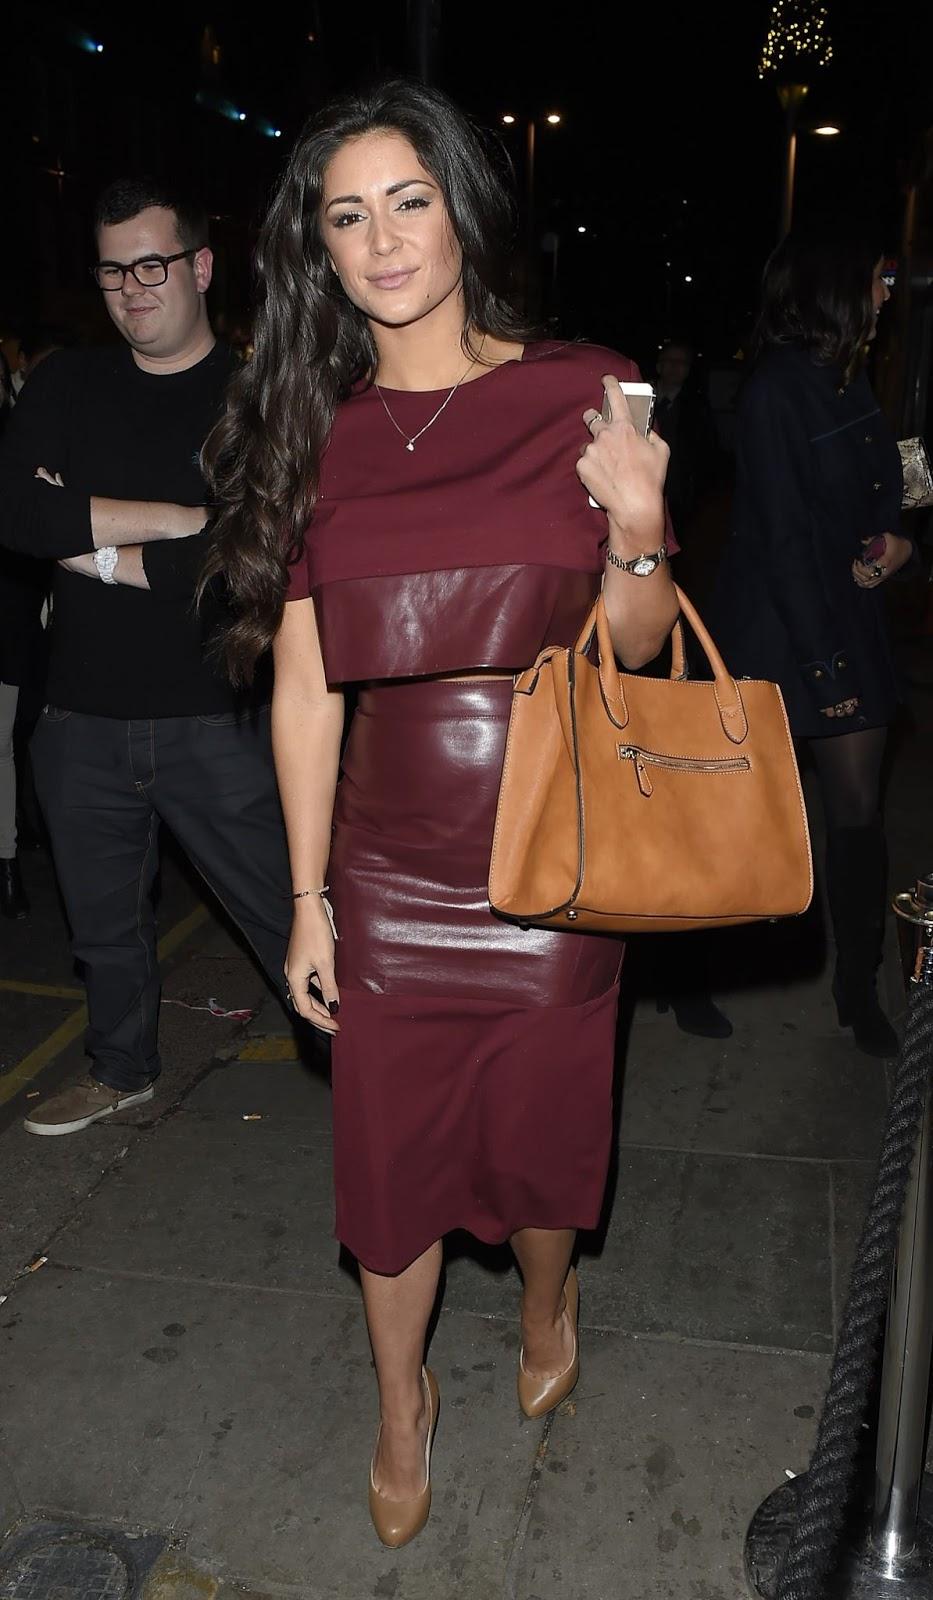 Casey Batchelor Leaves Raffles Club In Chelsea